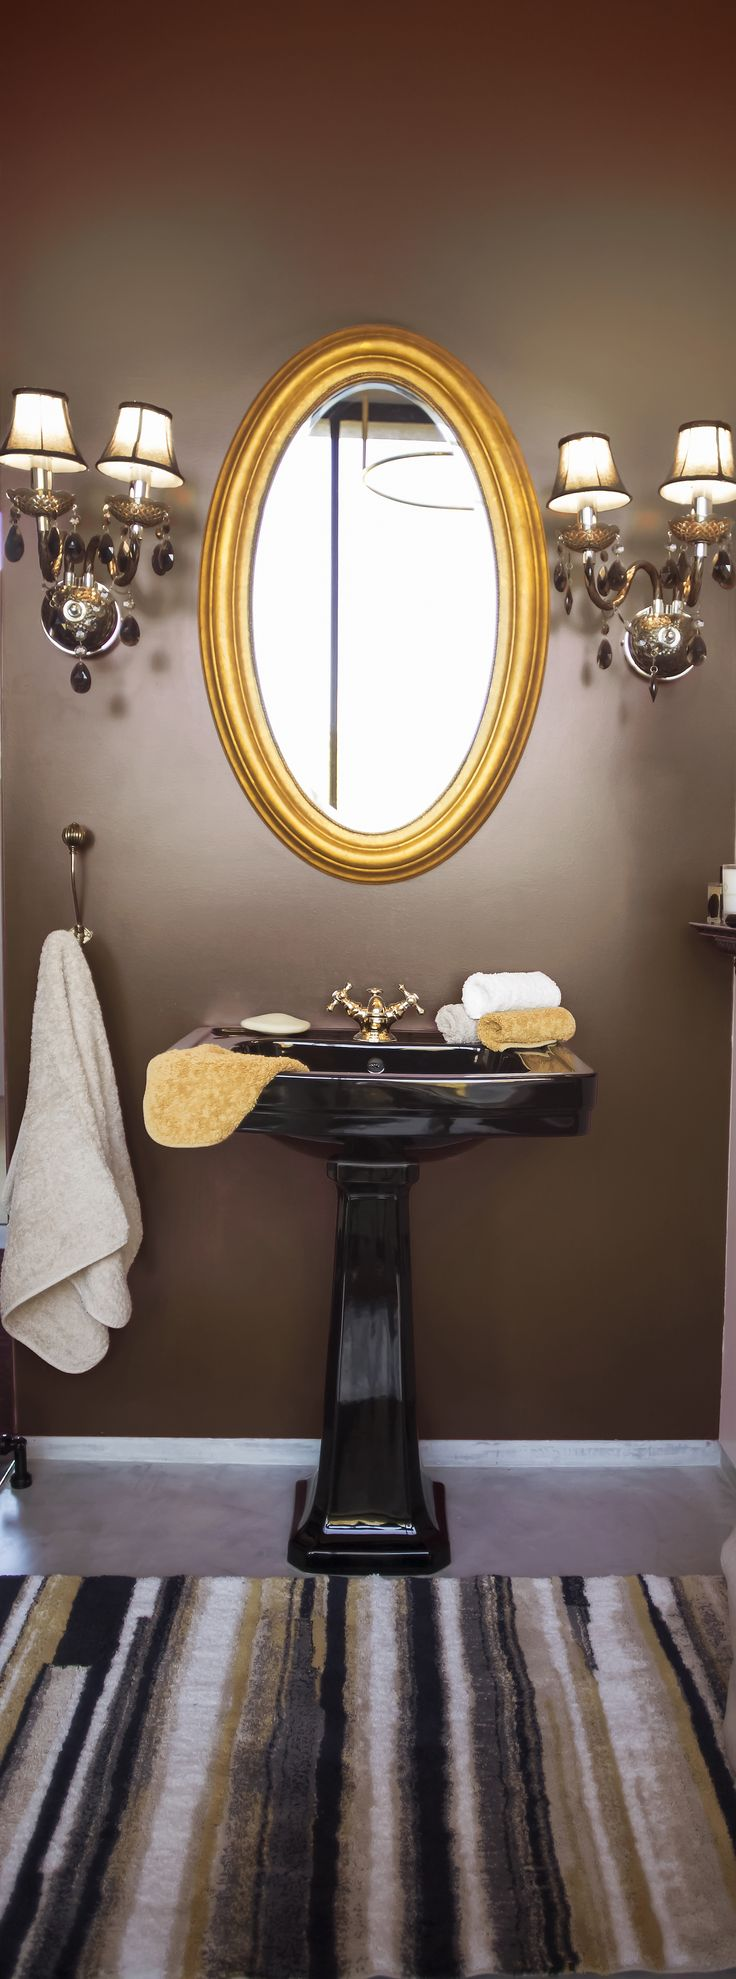 Best Abyss Habidecor Images On Pinterest Luxury Bath - Taupe bath rug for bathroom decorating ideas